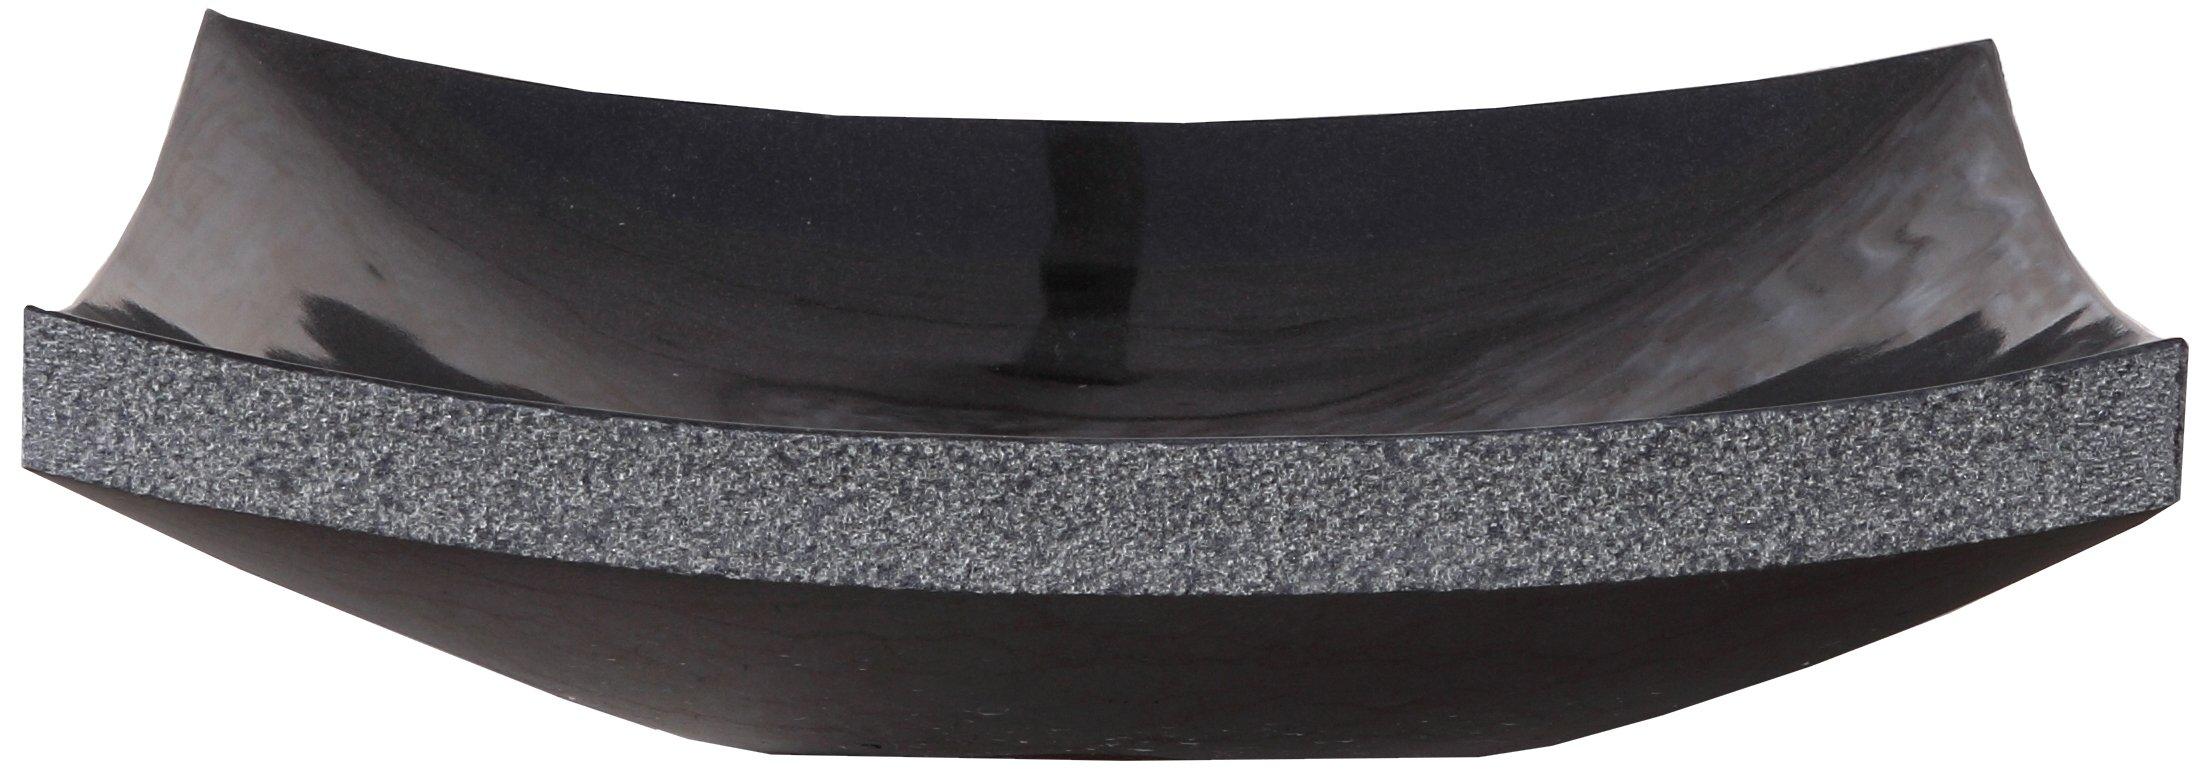 Virtu USA VST-2023-BAS Olympia Vessel Sink with Natural Shanxi Black Granite